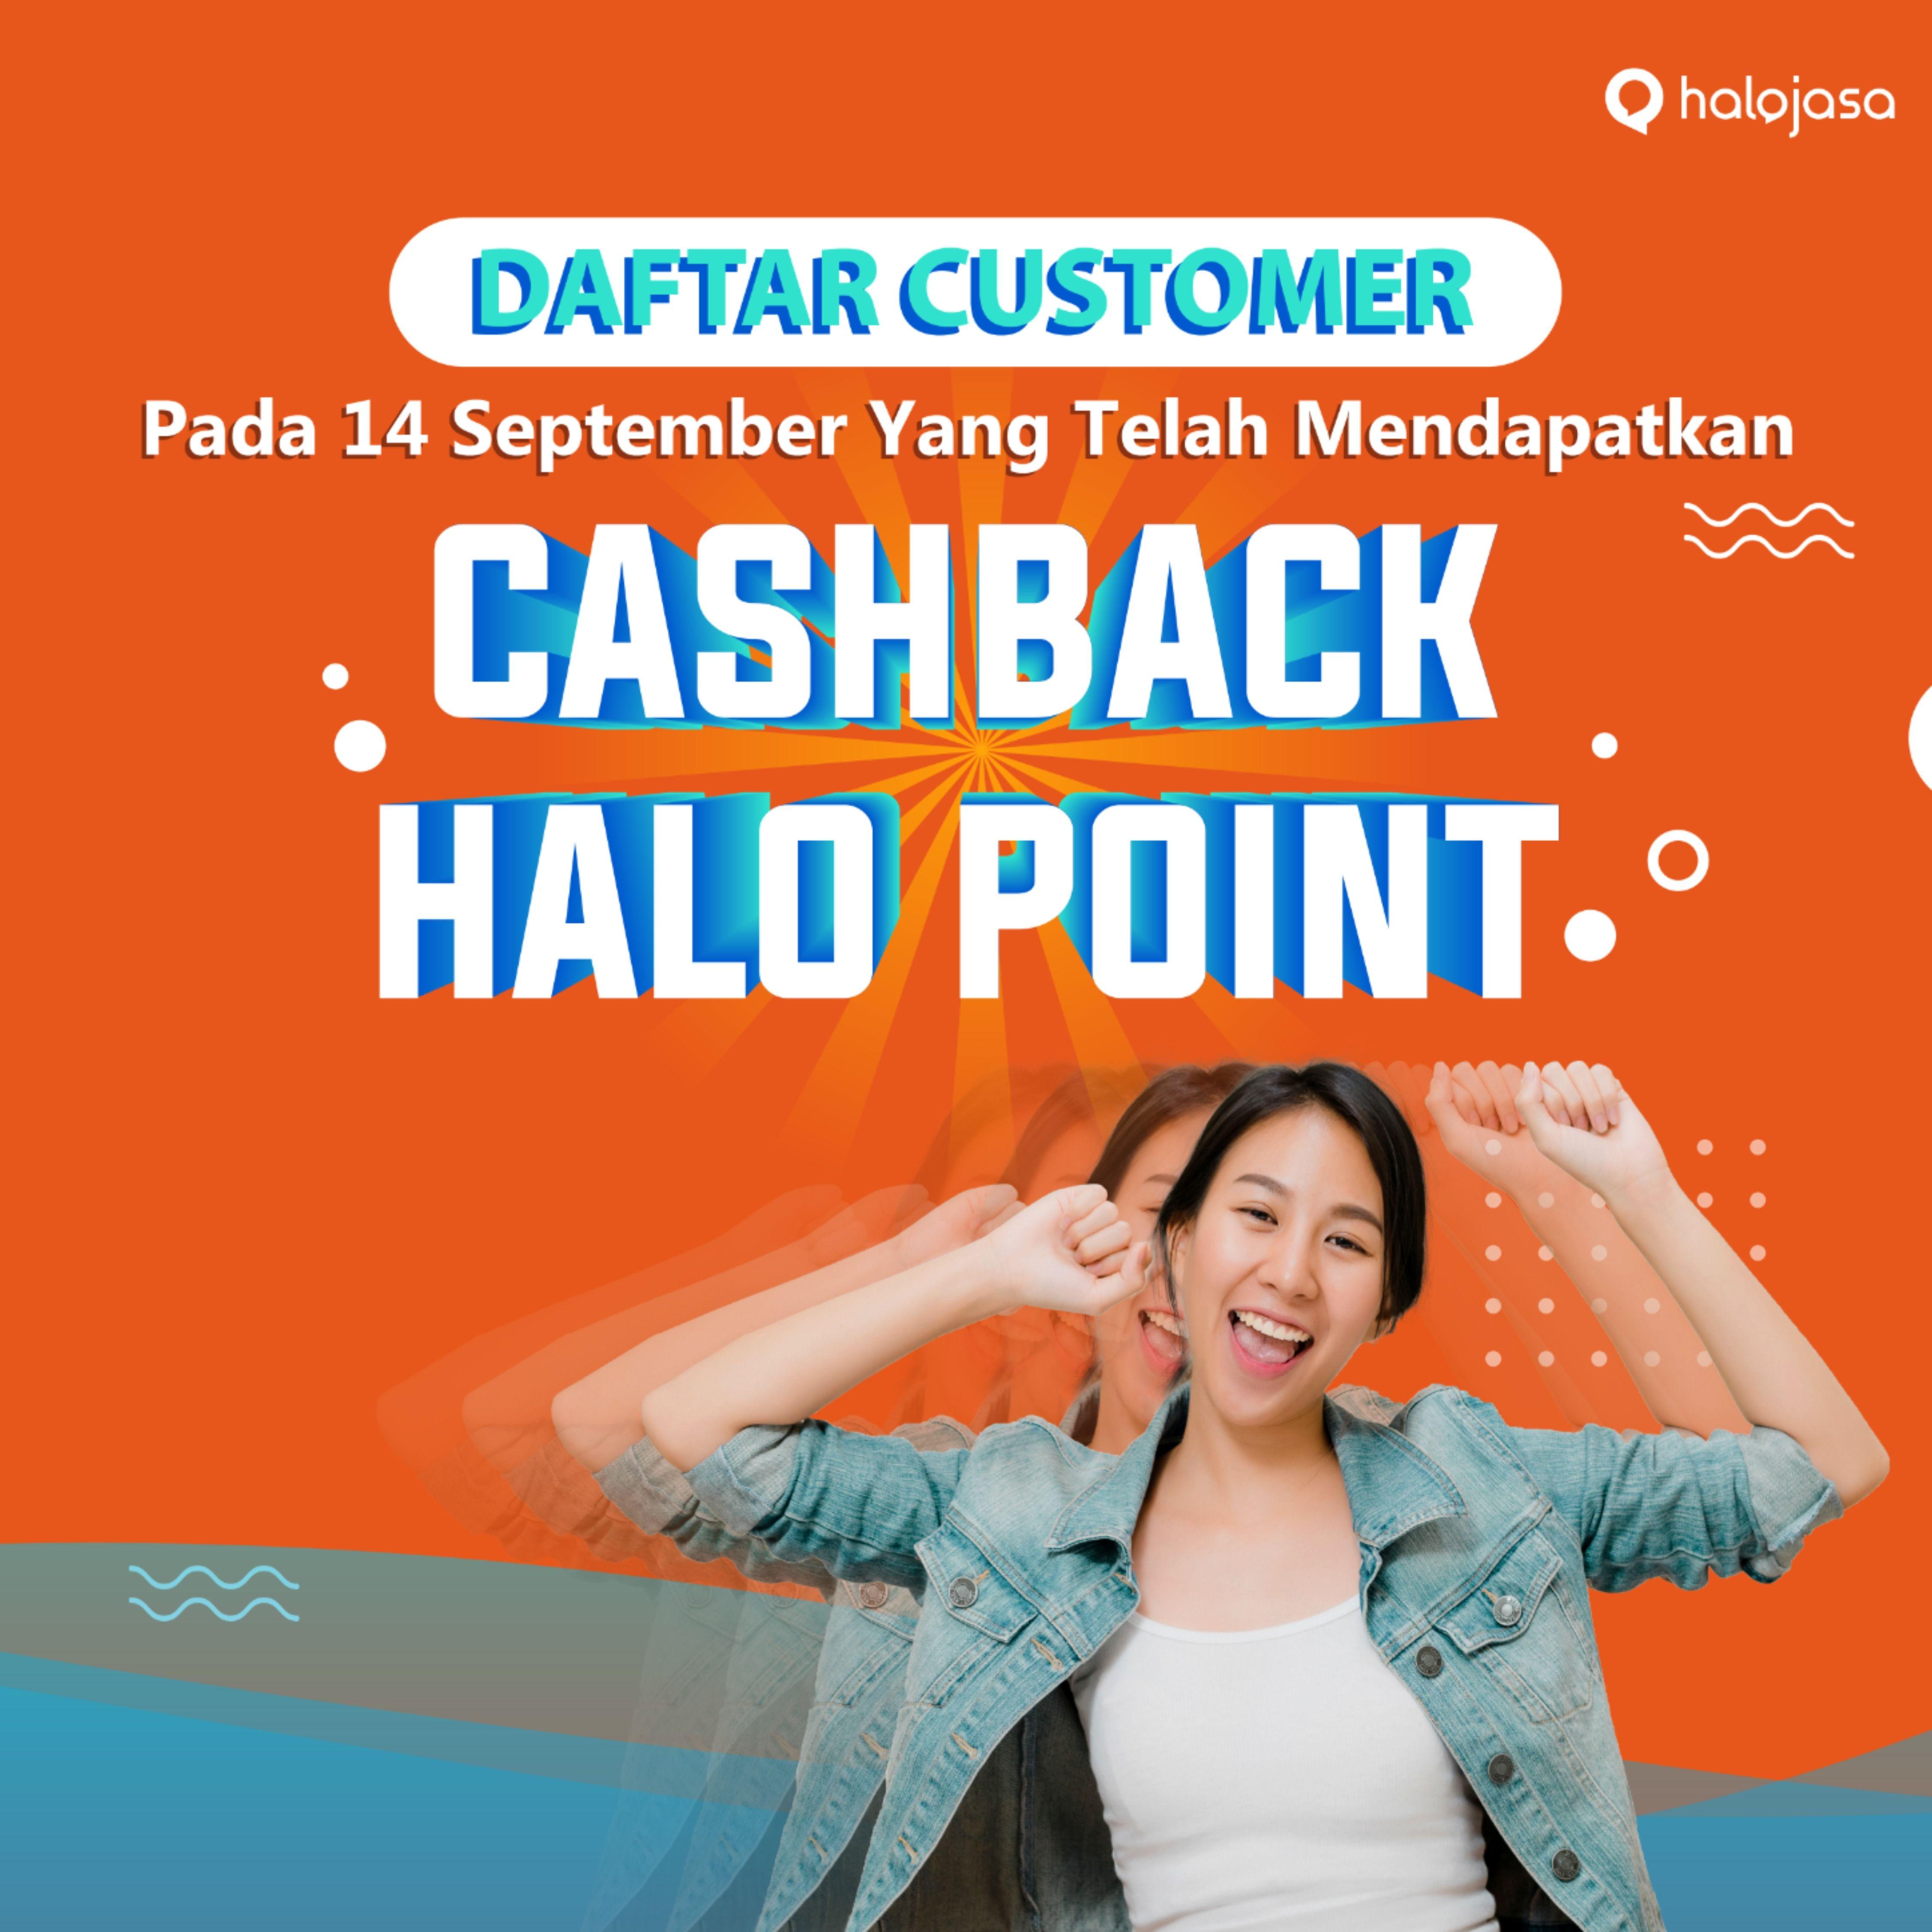 Cashback Halo Point Aplikasi Beri